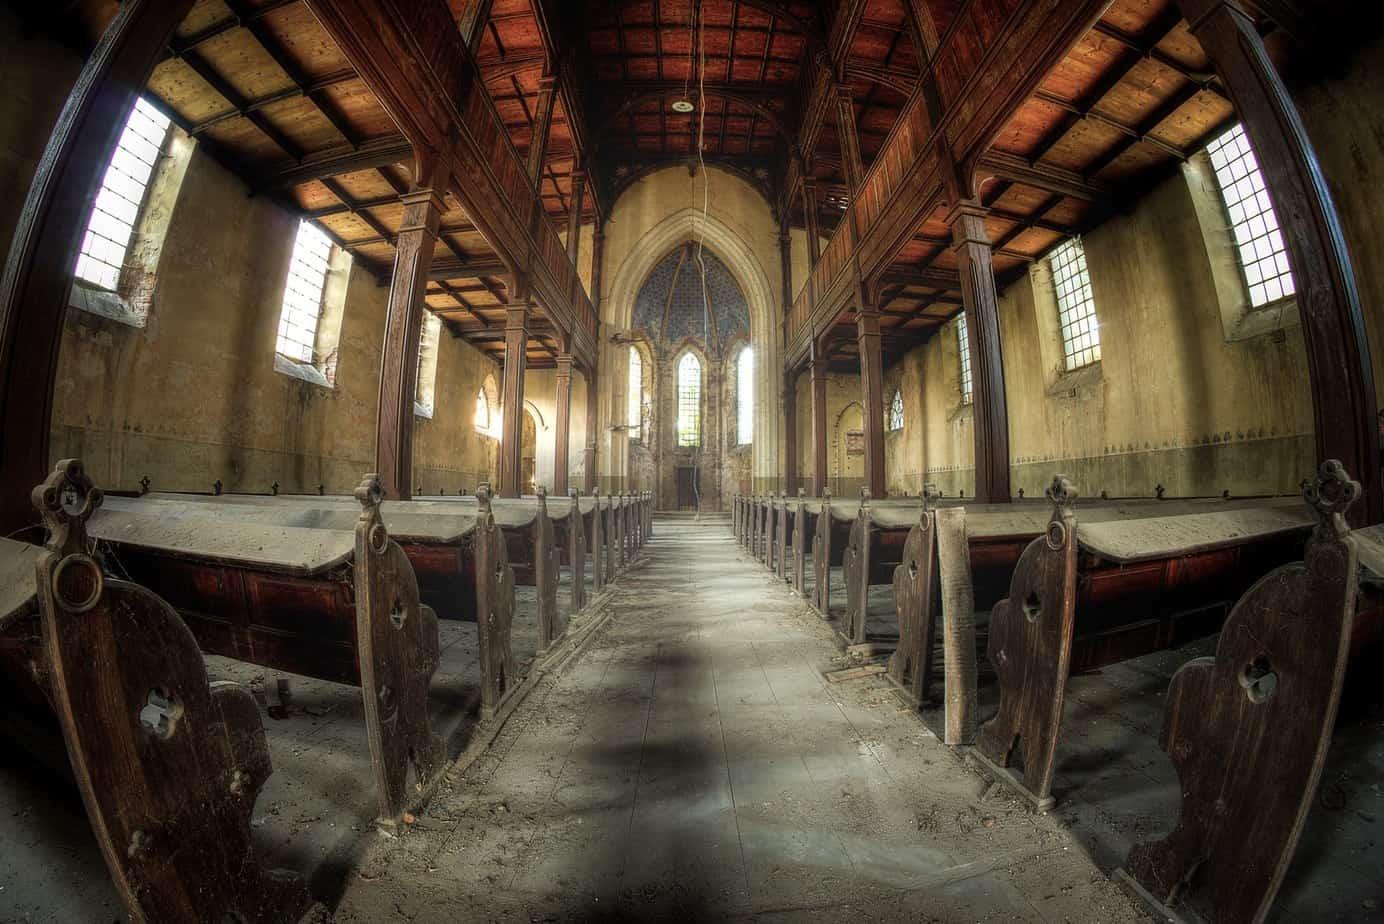 Fototour Lost Places in Polen geheime Orte entdecken